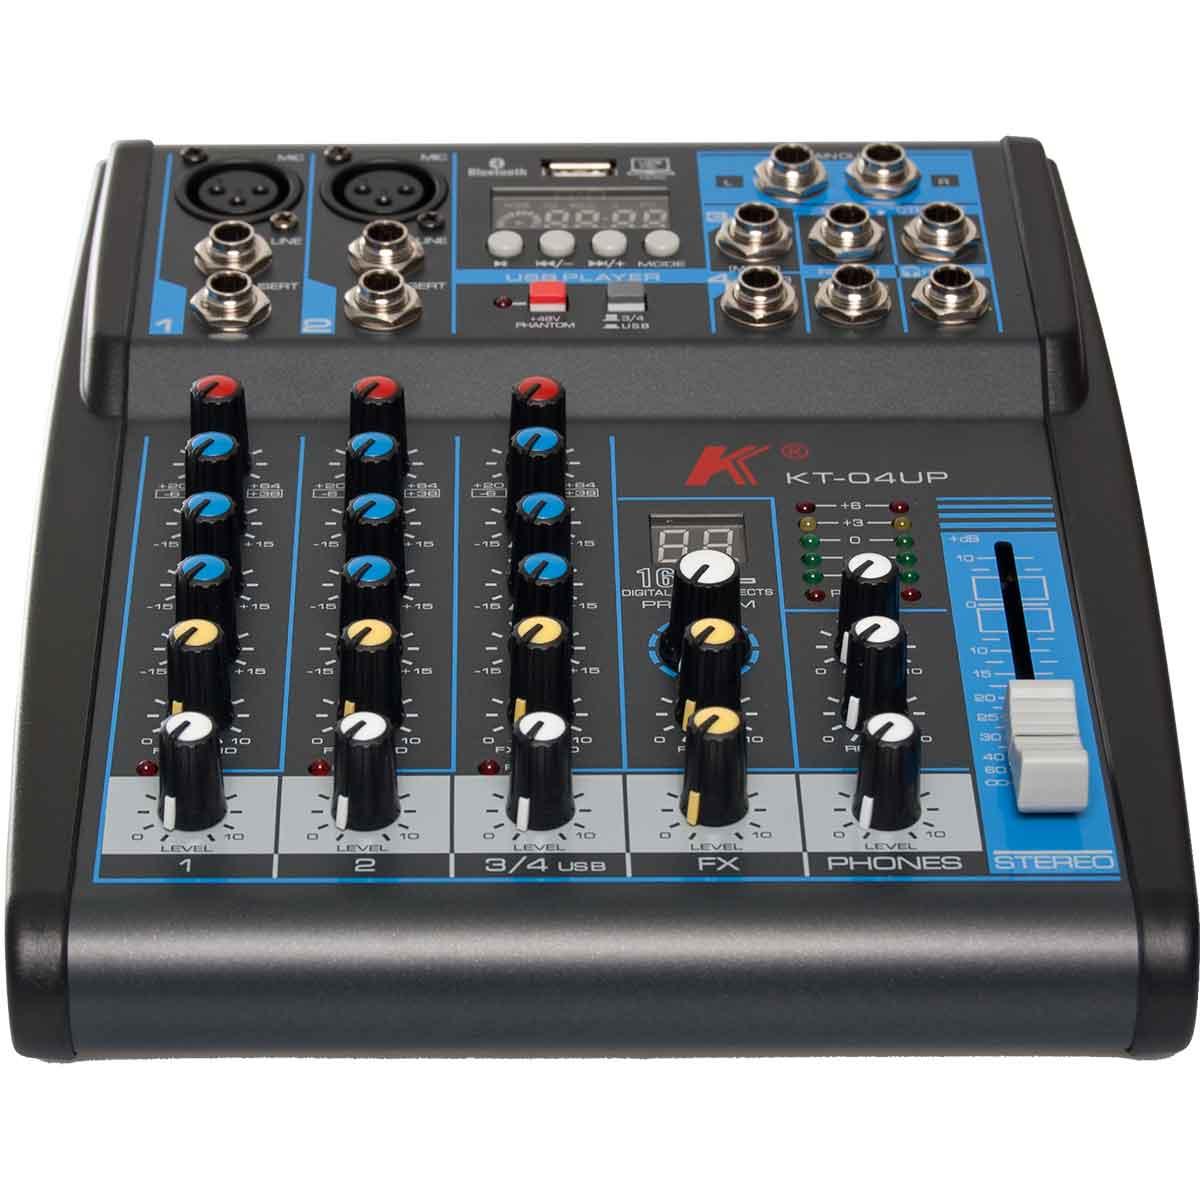 K KT-04UP mixer